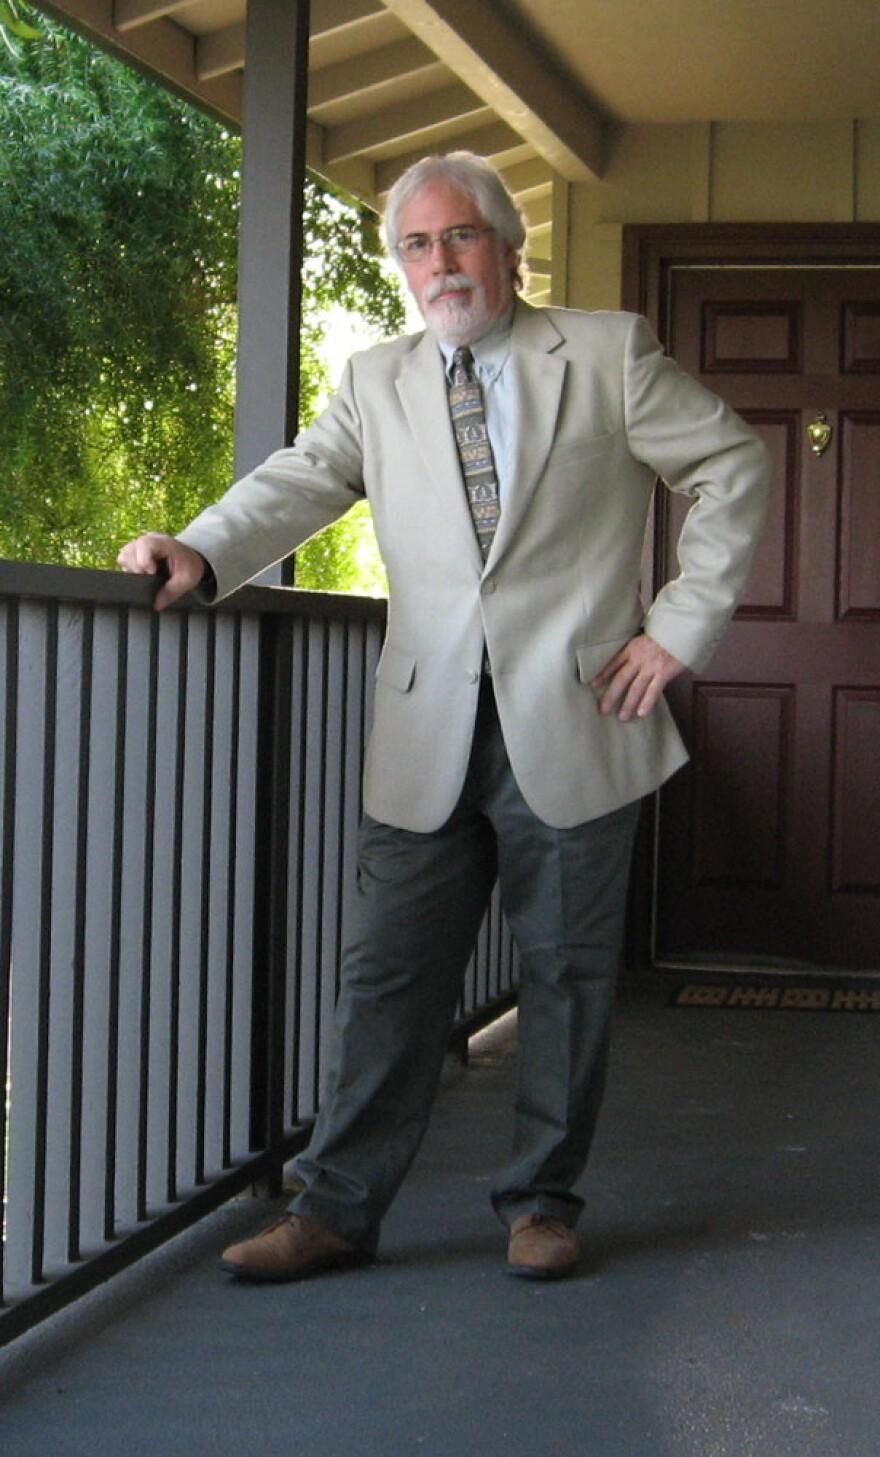 Joseph DiVerdi is a chemistry professor and cannabis researcher at Colorado State University.